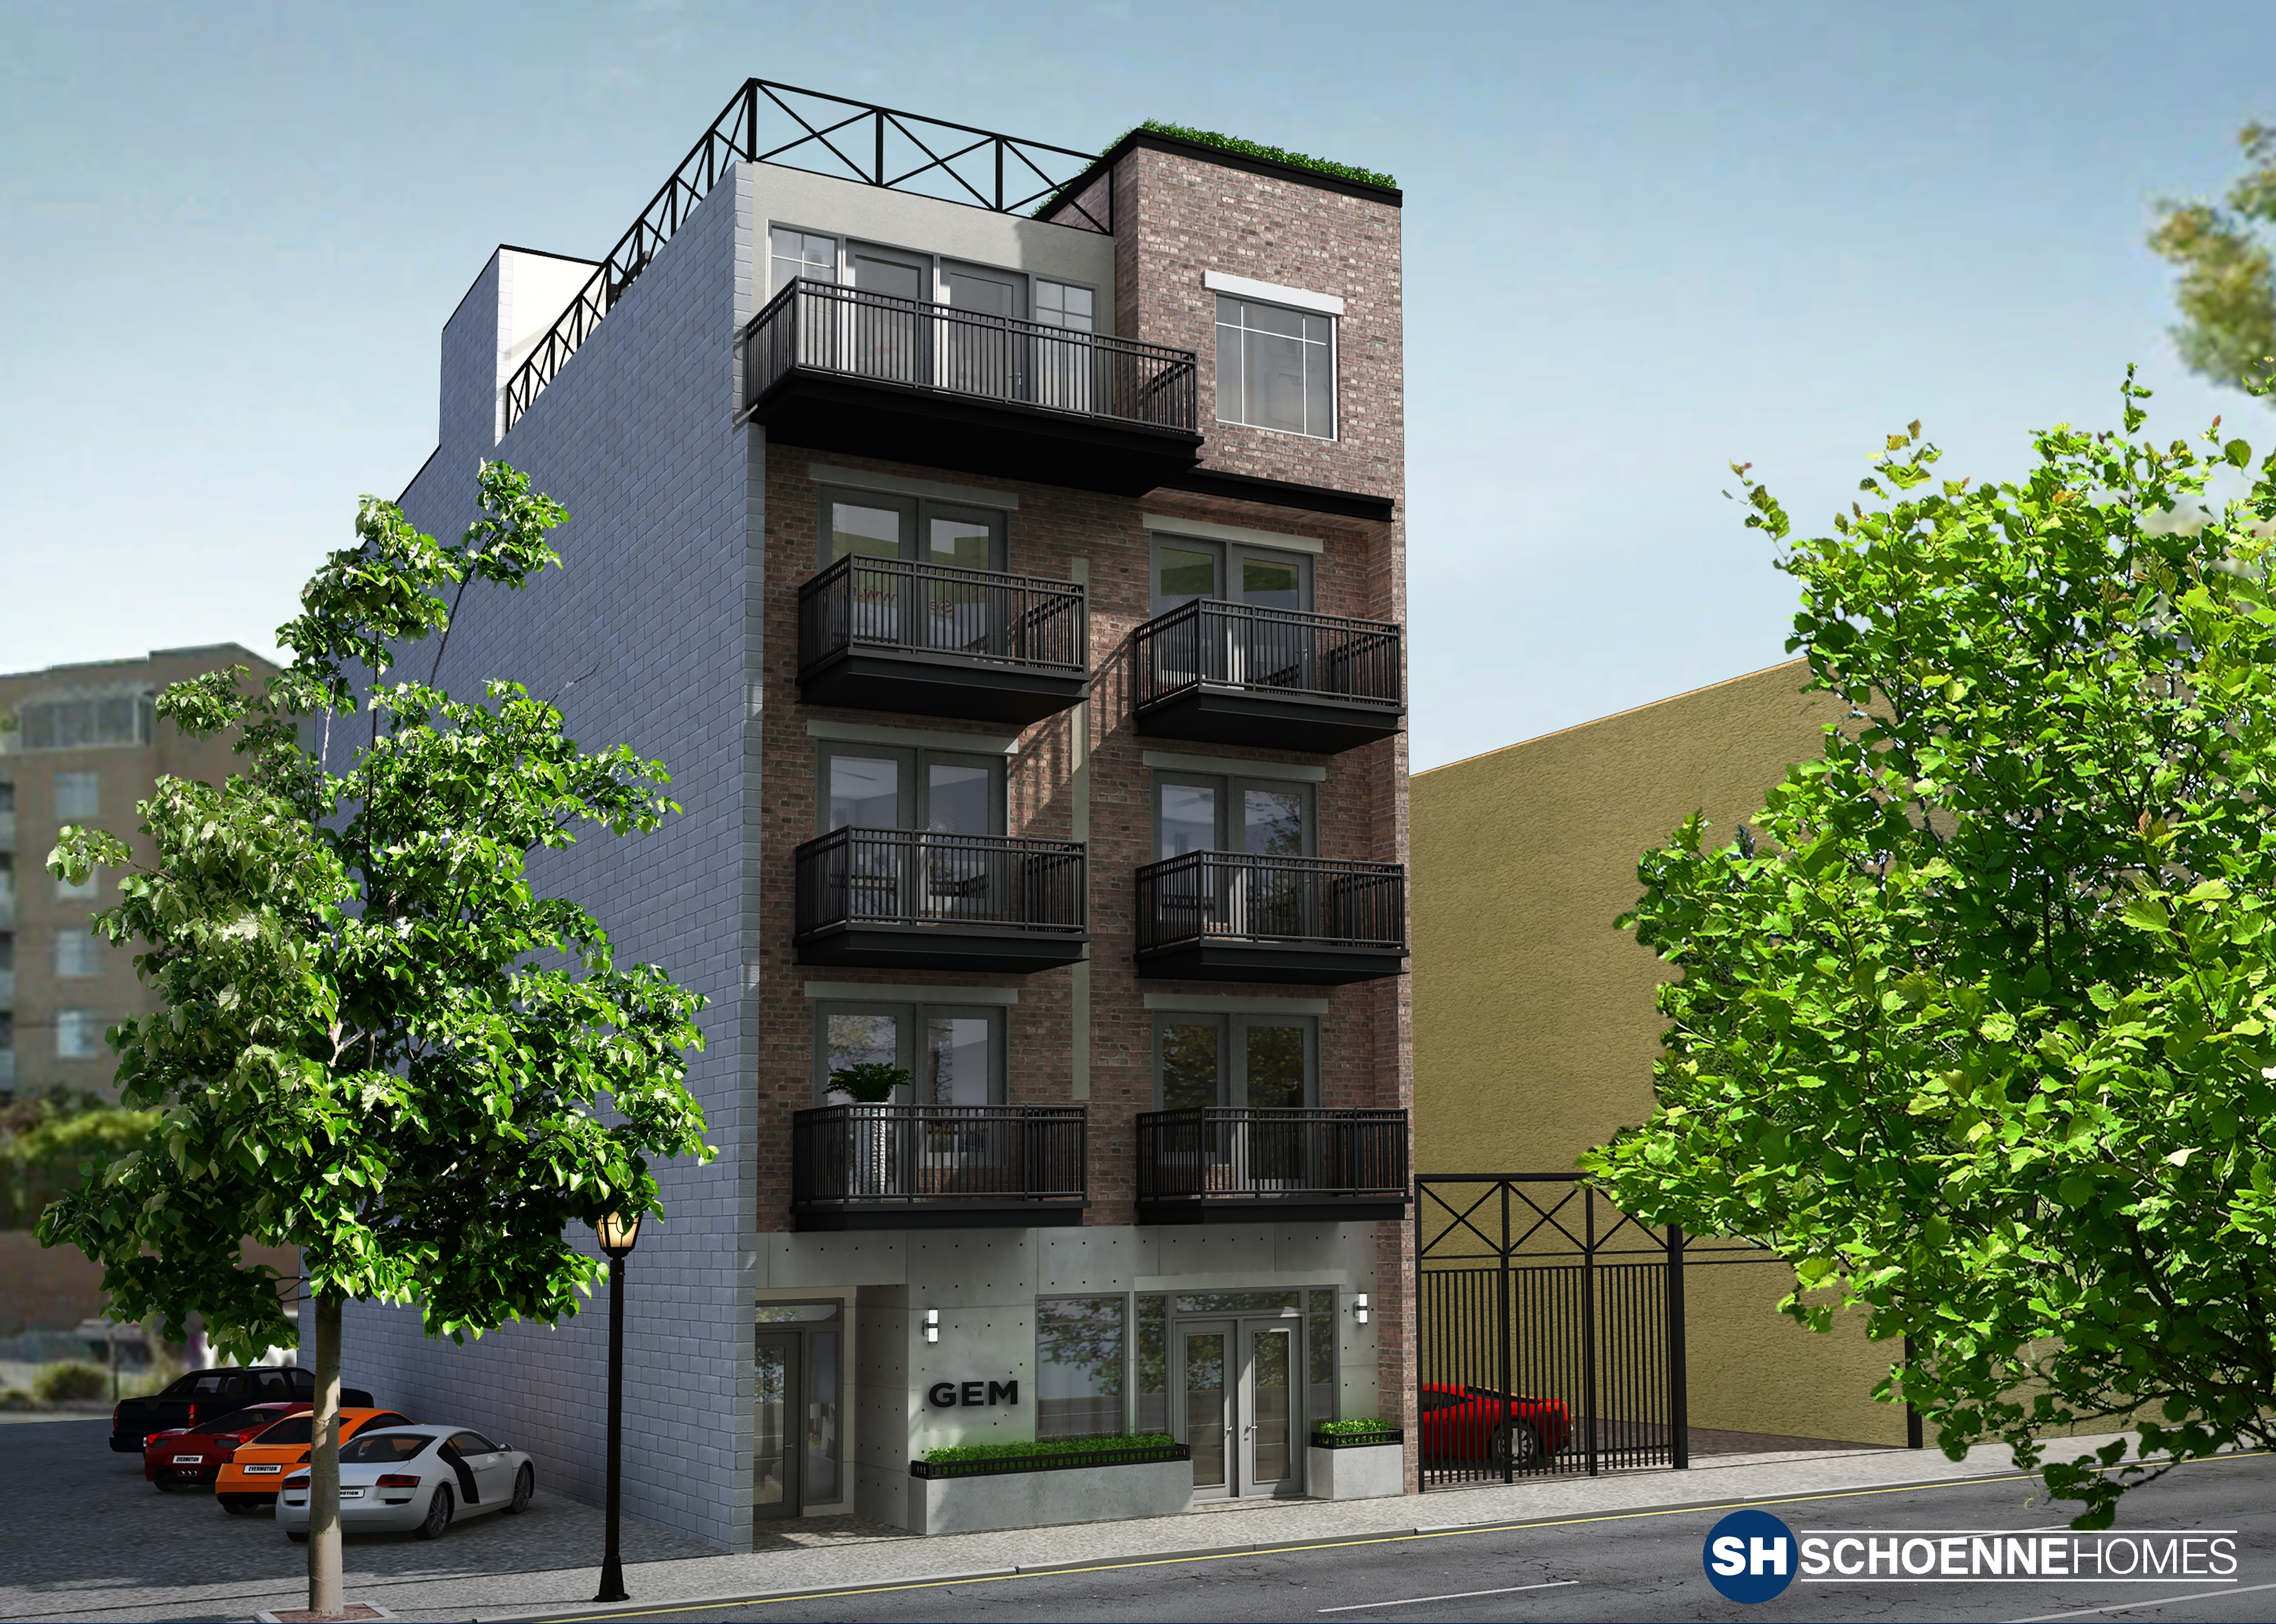 135 Front Street - Schoenne Homes